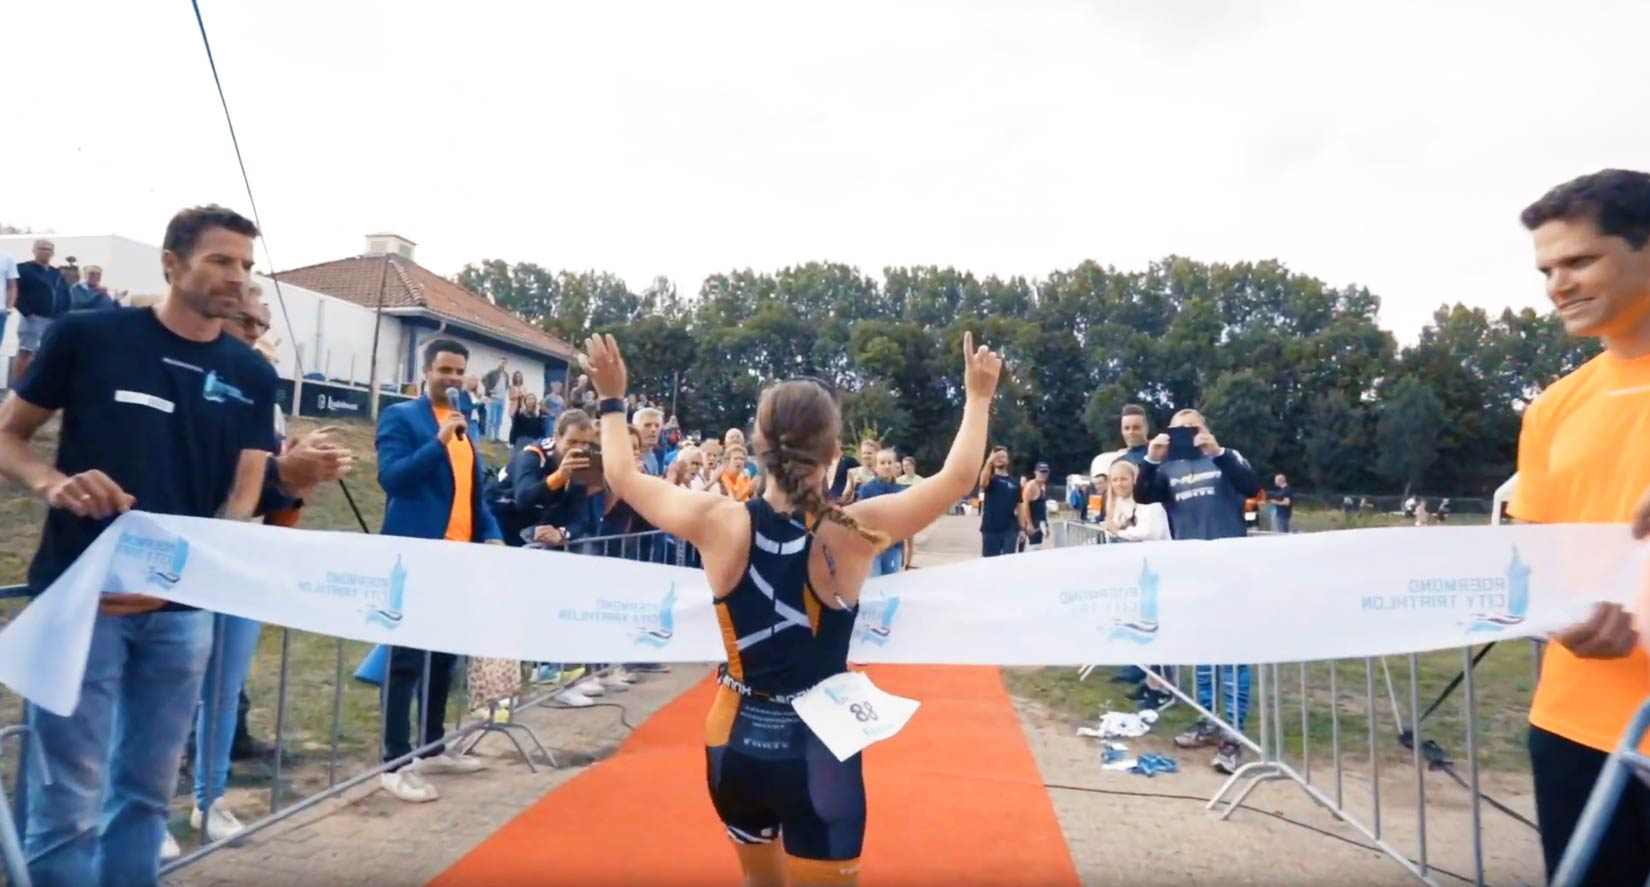 Roermond_City_Triathlon-Area_X_Roermond-foto1